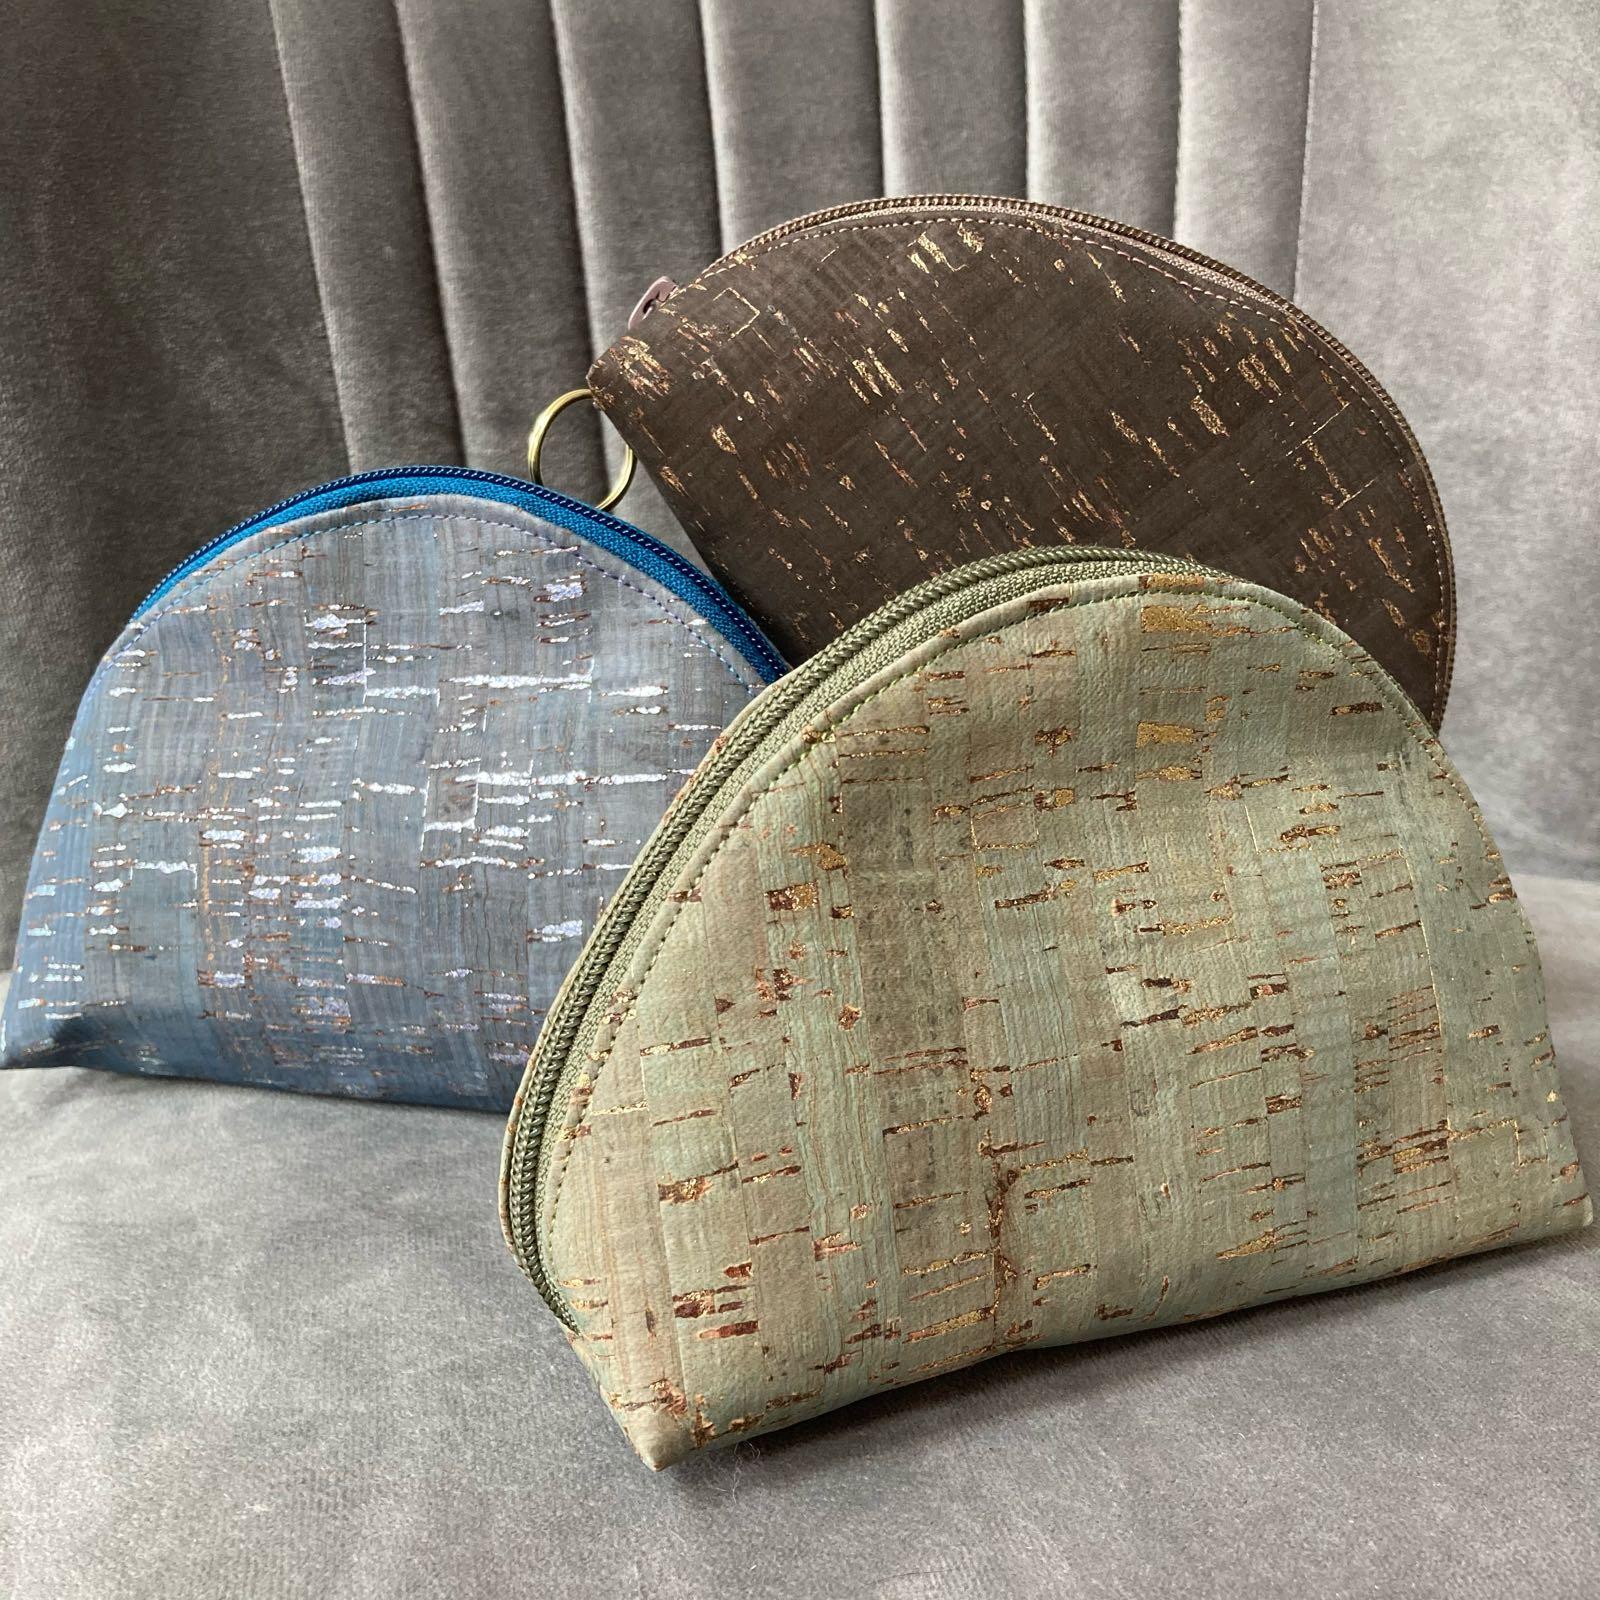 Cork fabric Make up pouch by Stella's stich craft